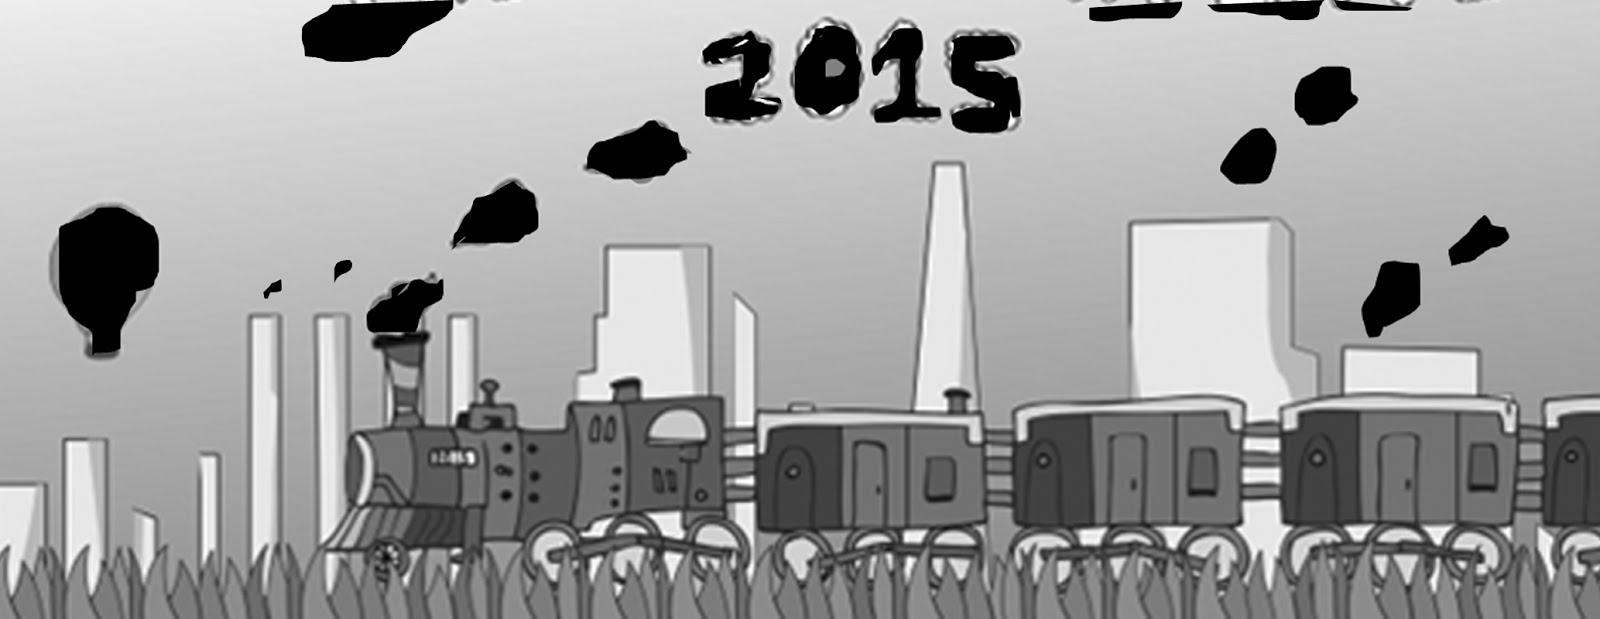 treno a vapore solvay